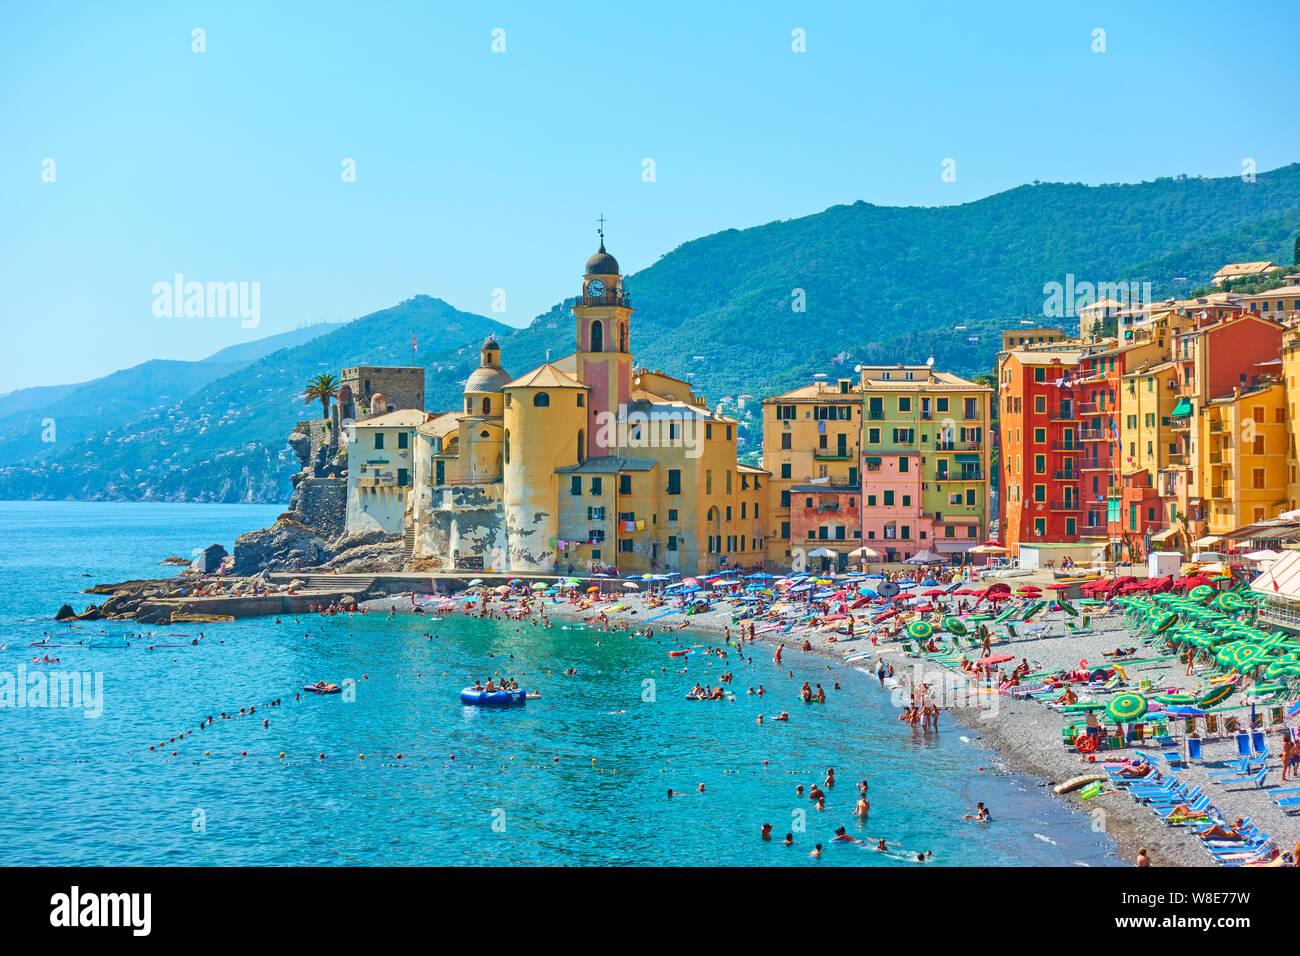 Camogli Genoa Italy July 1 2019 Beach And Waterfront In Camogli Town Near Genoa On Sunny Summer Day Liguria Stock Photo Alamy